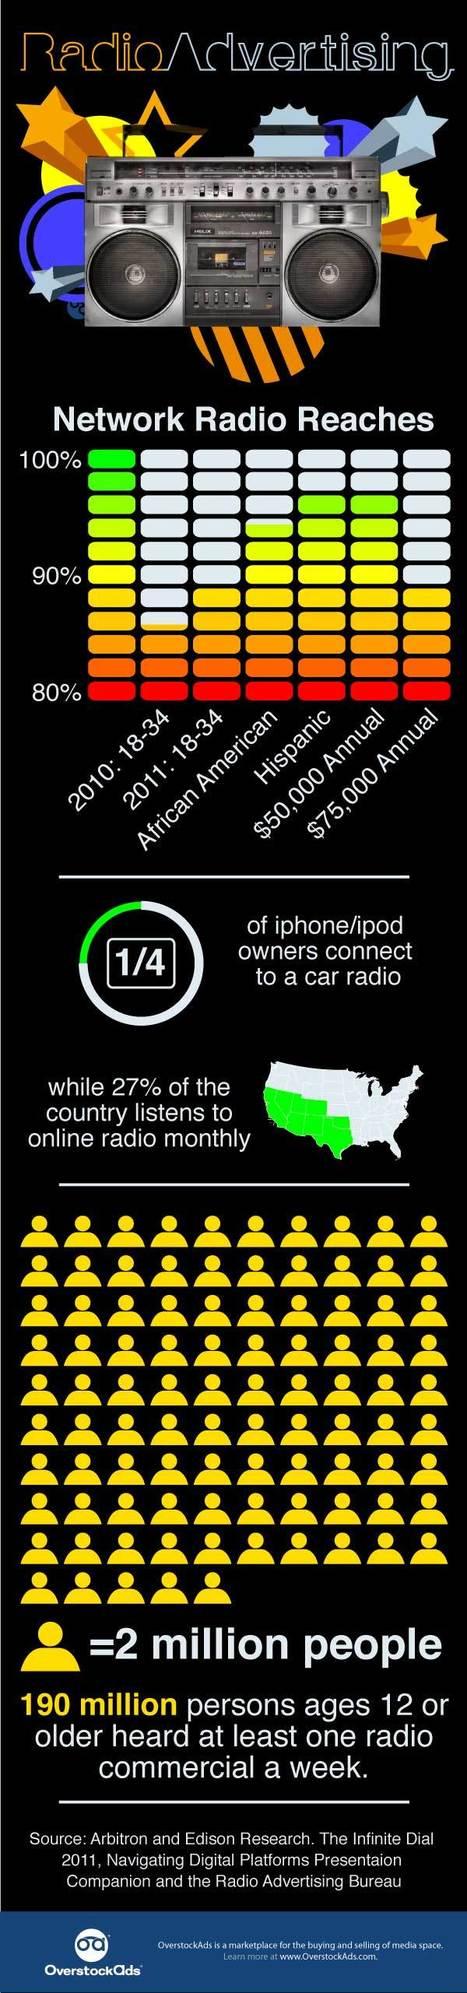 The Power of Radio Advertising | OverstockAds Blog | Radio 2.0 (En & Fr) | Scoop.it